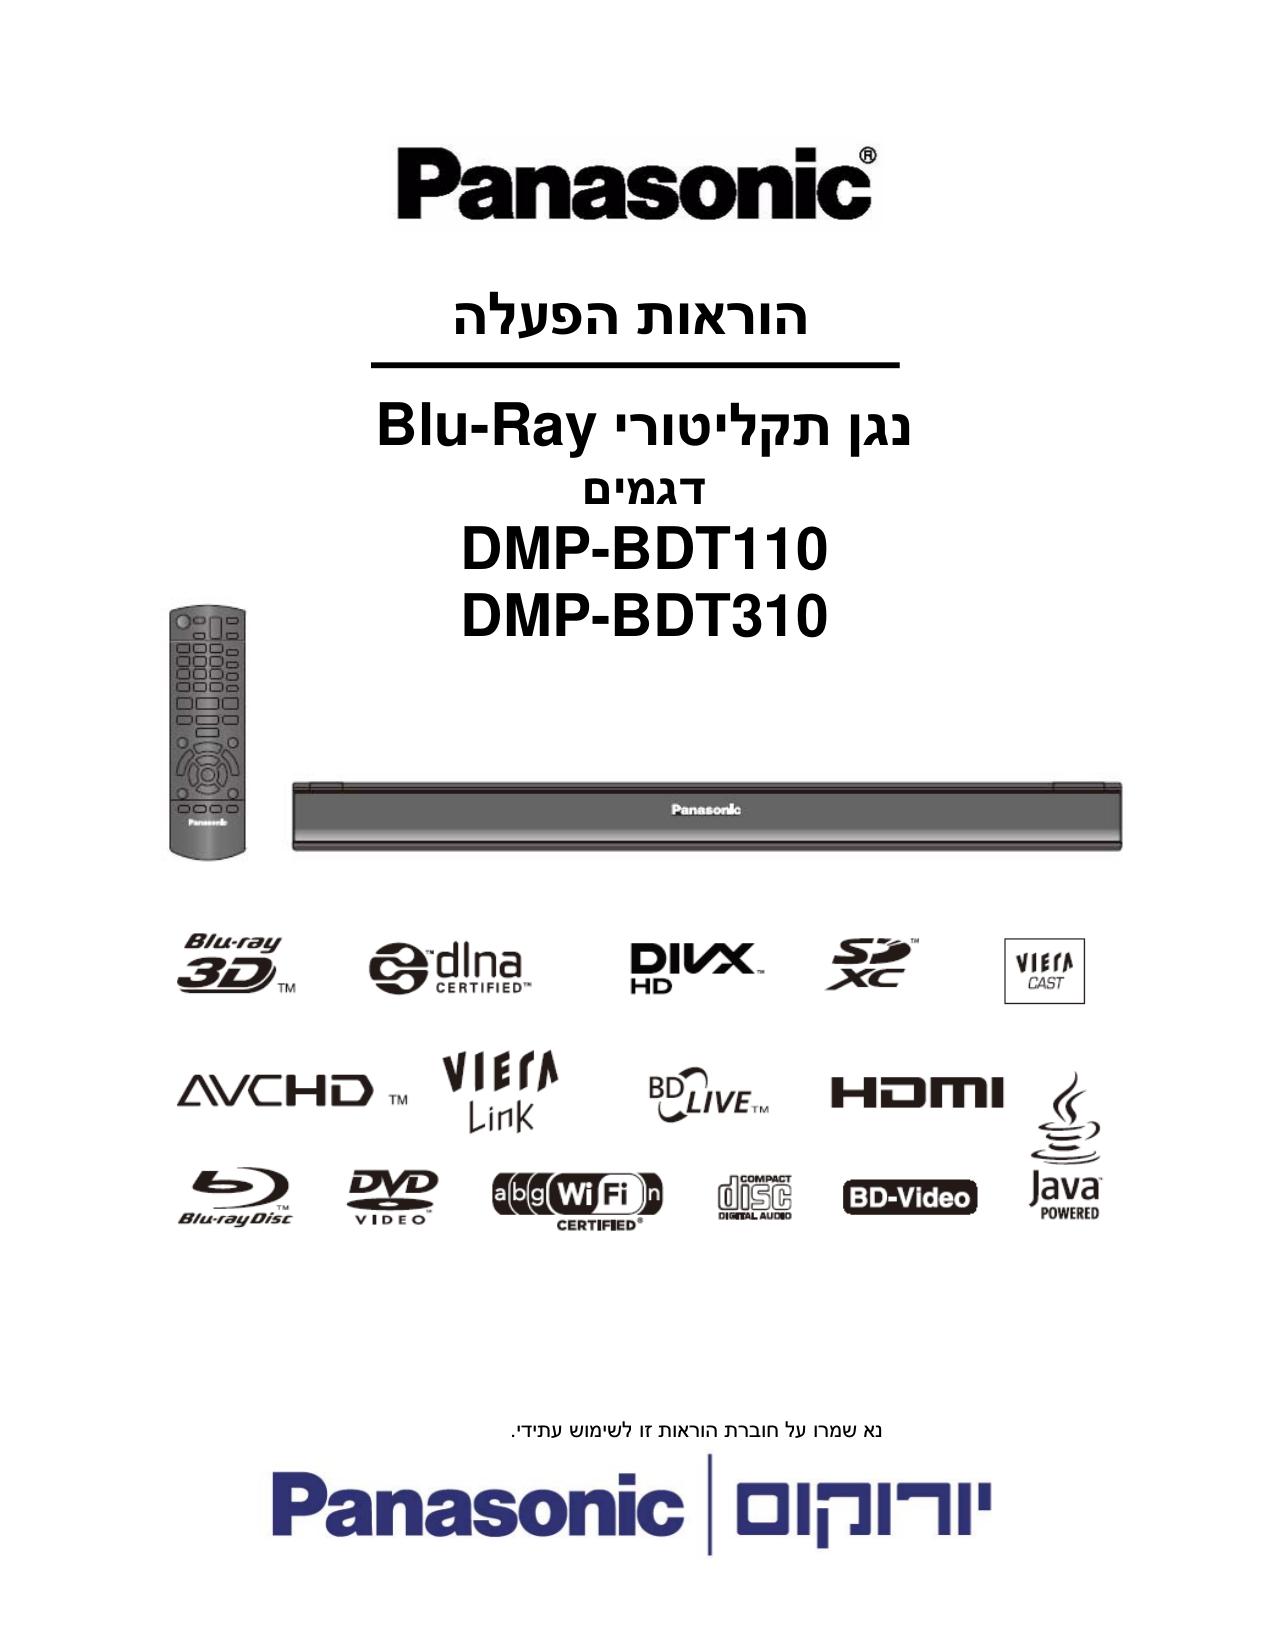 download free pdf for panasonic dmp bdt110 dvd players manual rh umlib com panasonic dmp bdt110 user manual dmp-bdt110 manual